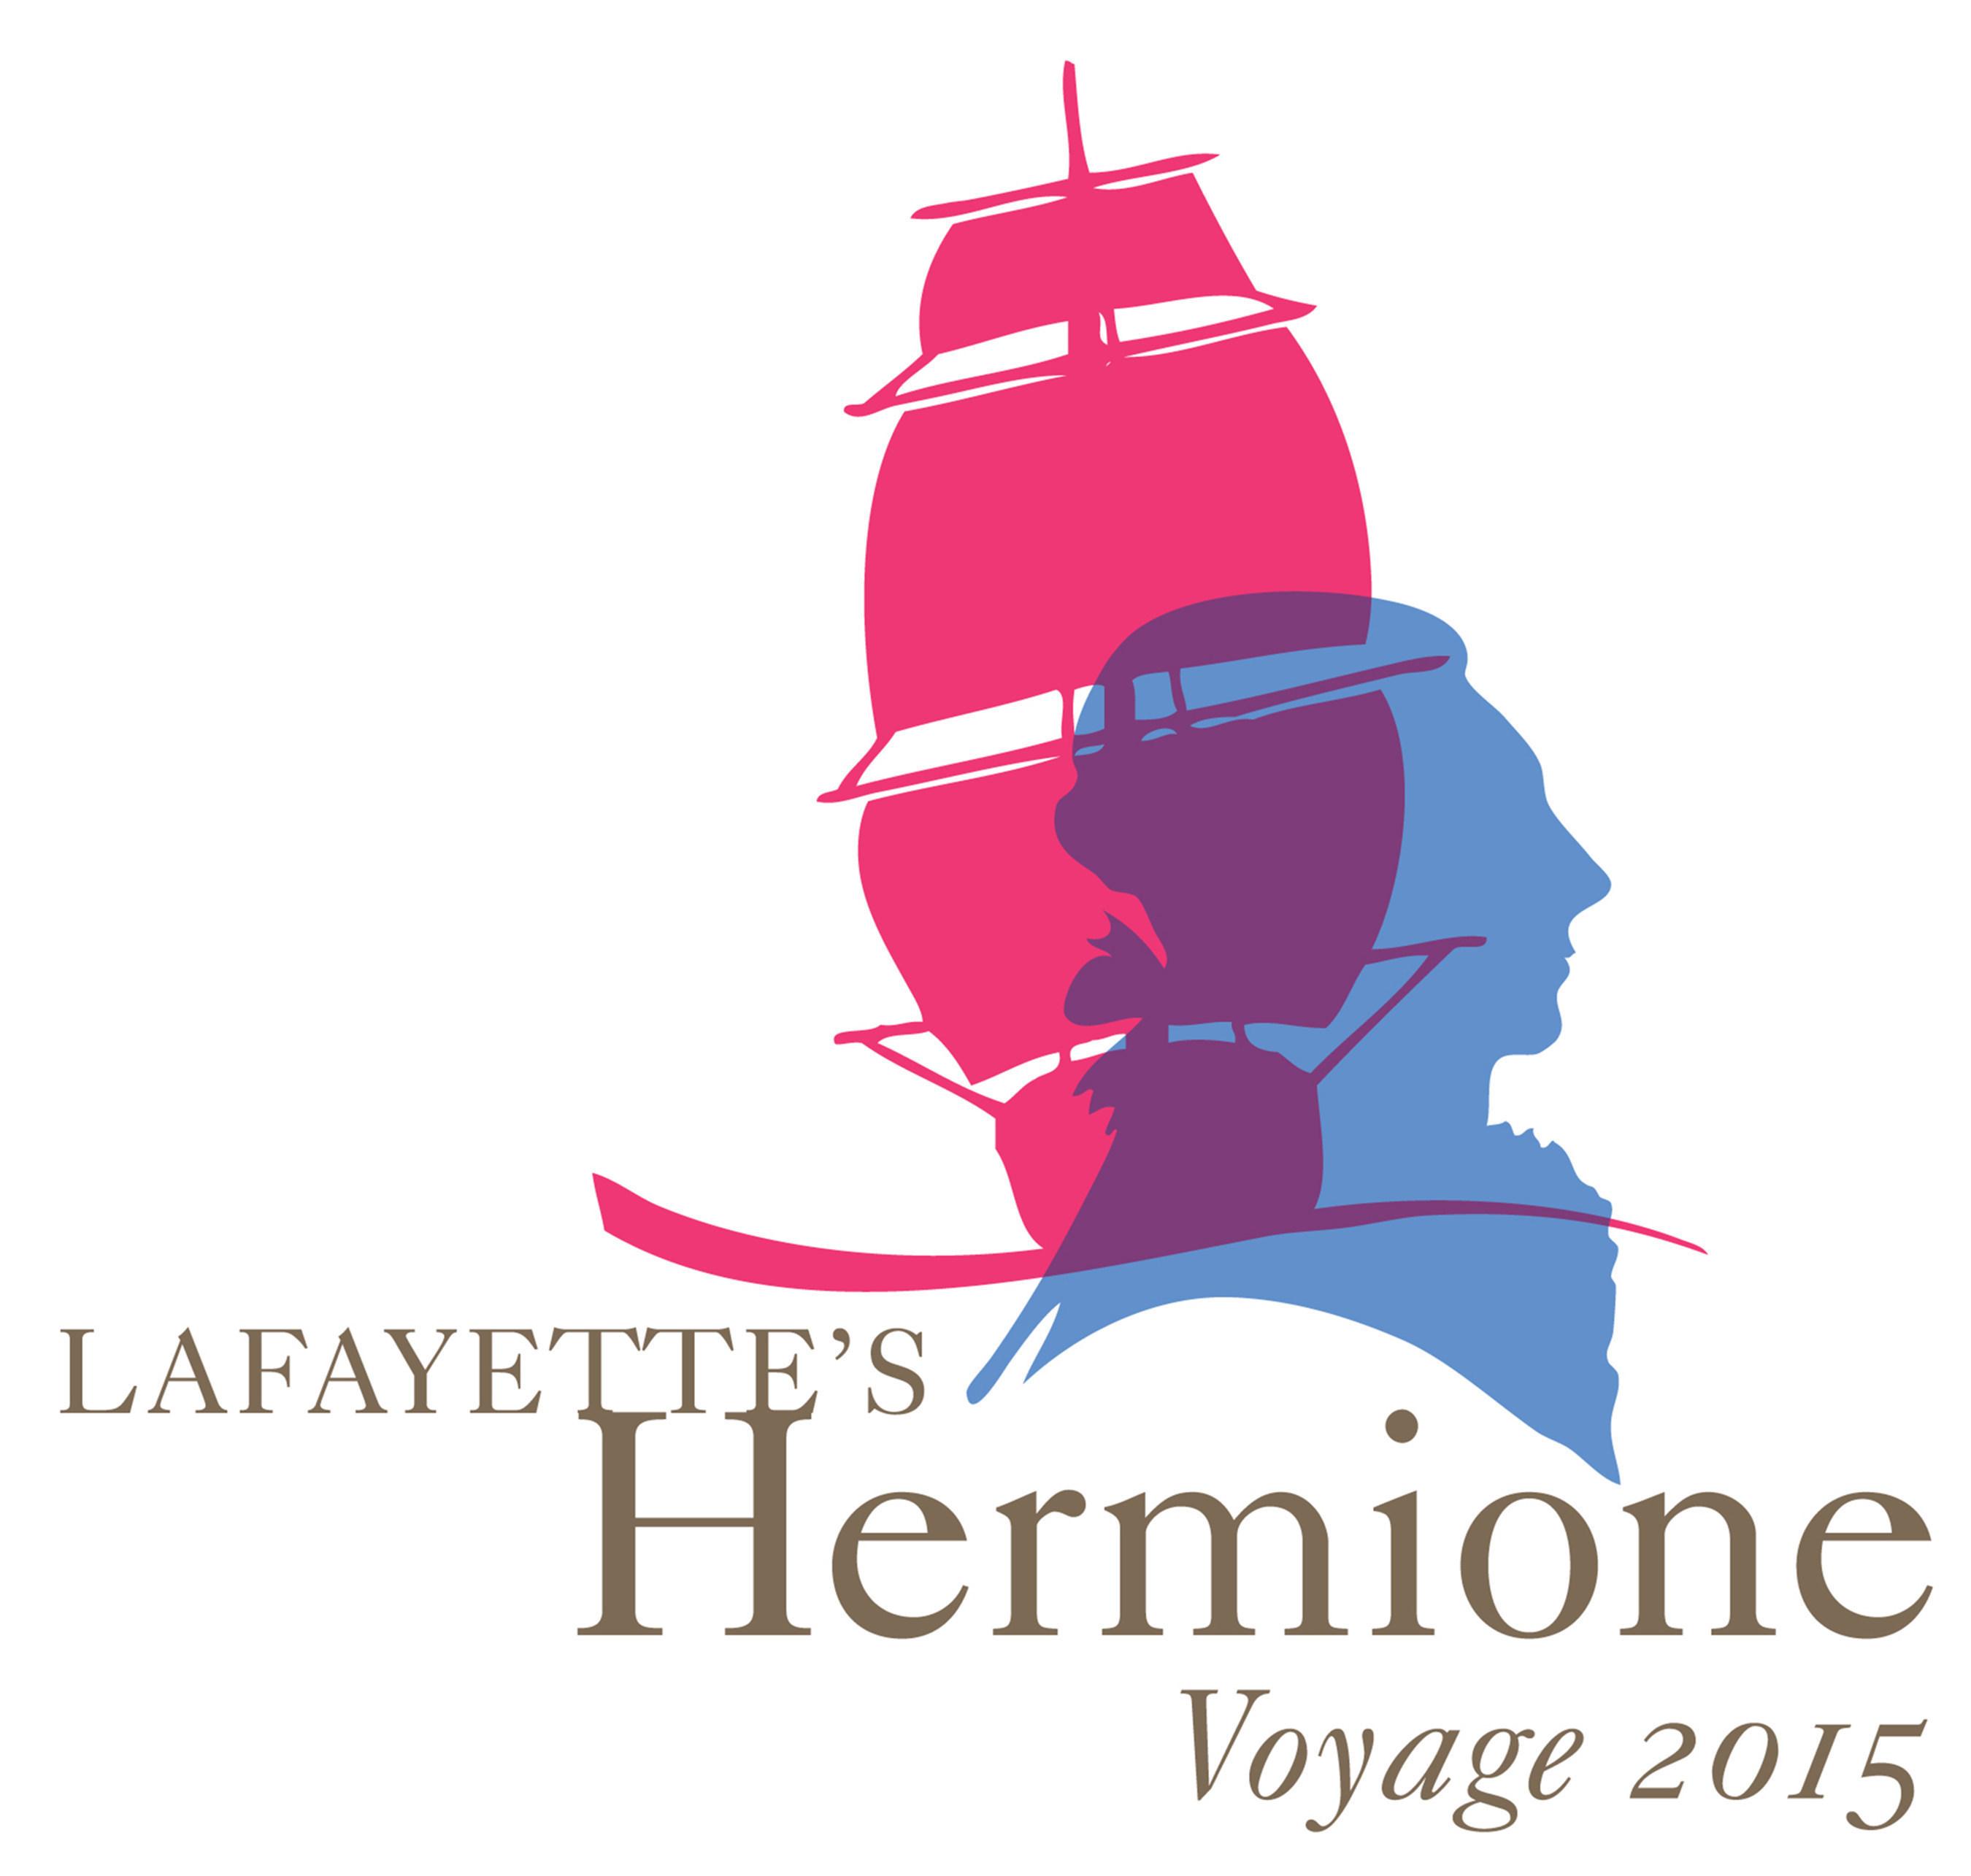 Lafayette's Hermione Voyage Logo